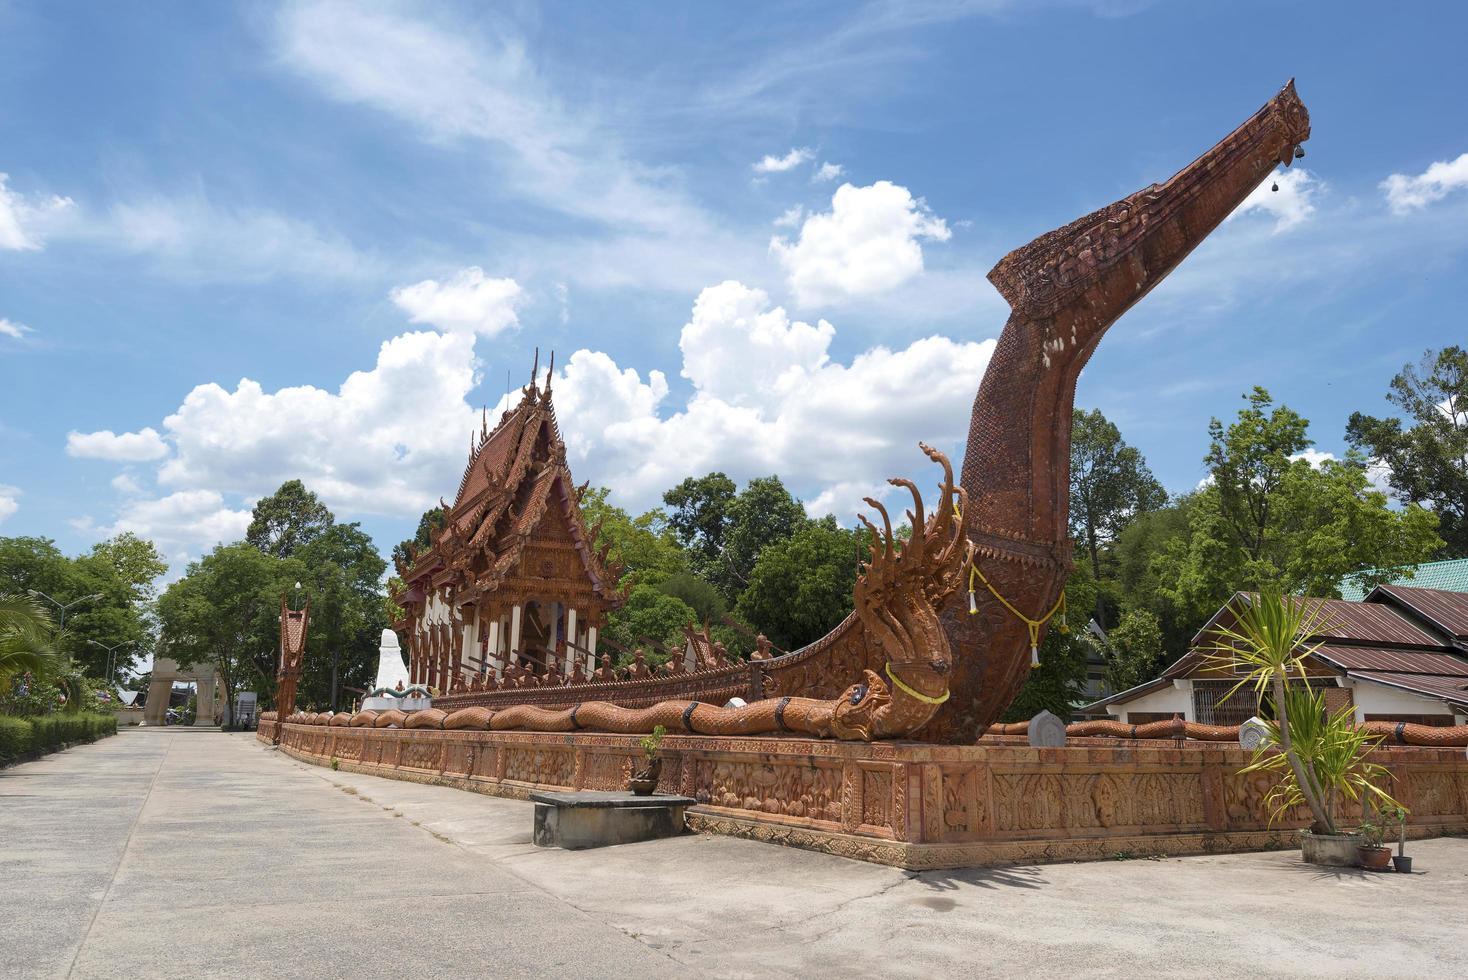 Wat Ban Na Muang buddhistischer Tempel in Ubon Ratchathani, Thailand foto